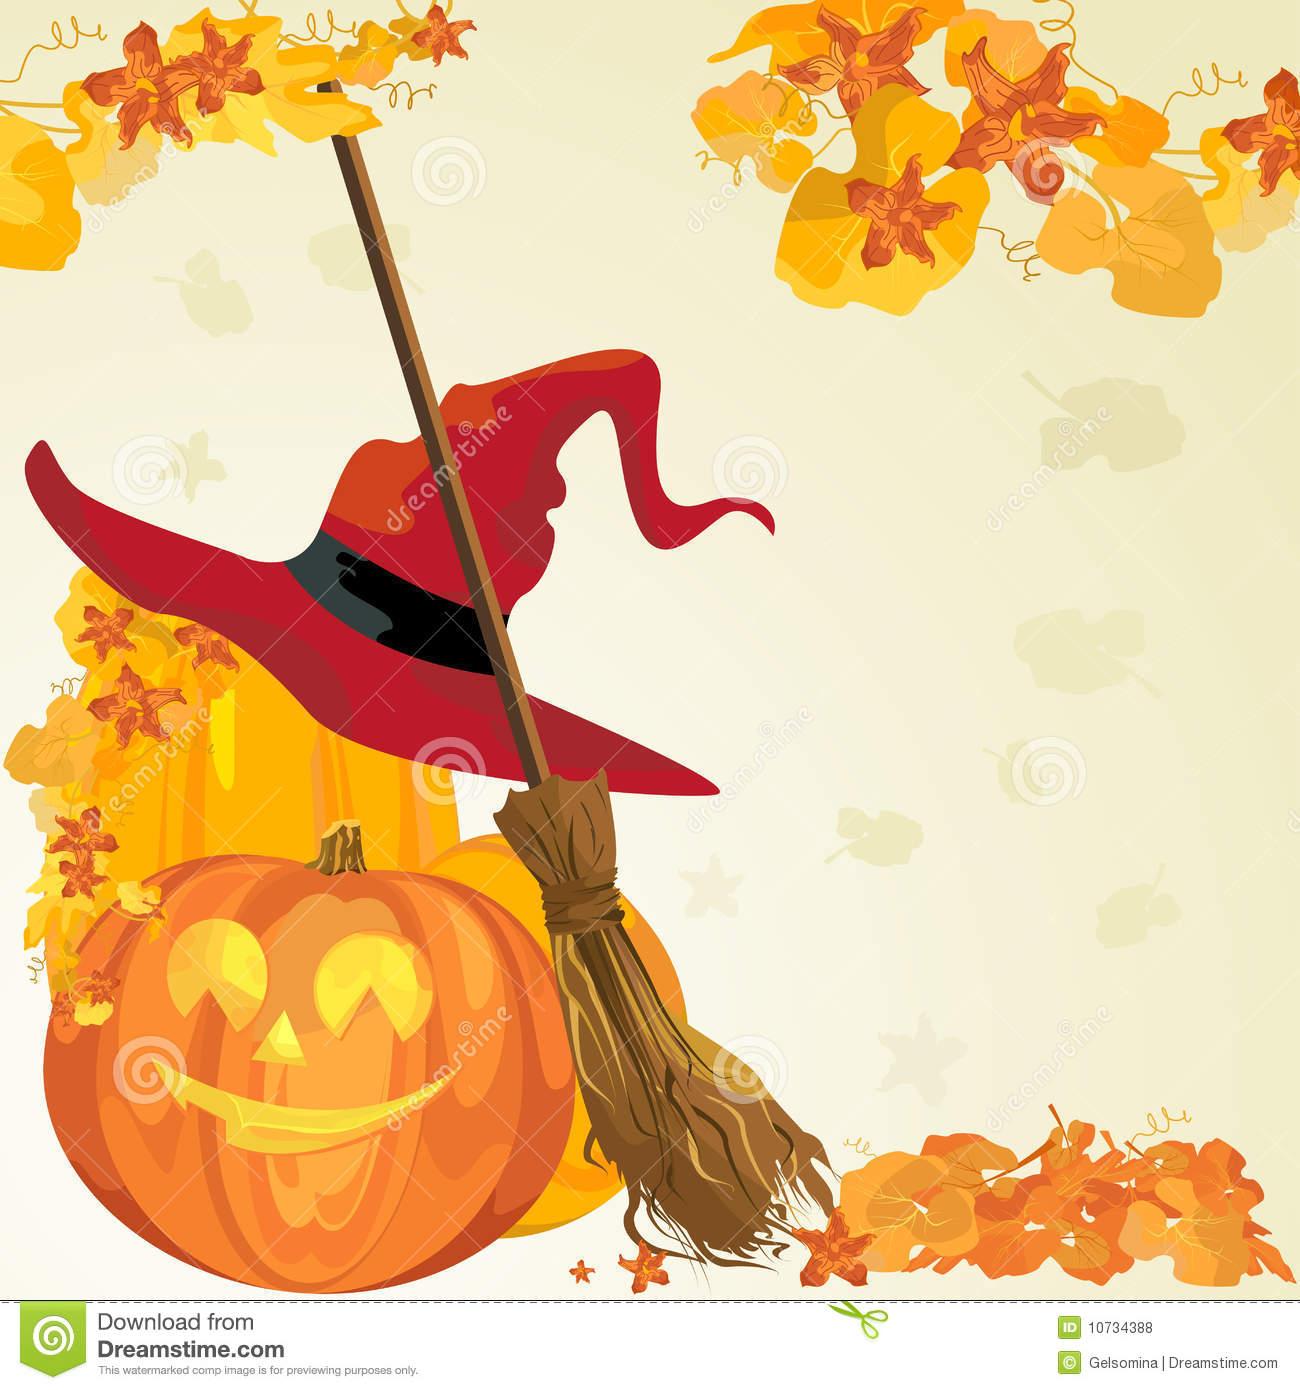 Free Halloween Borders